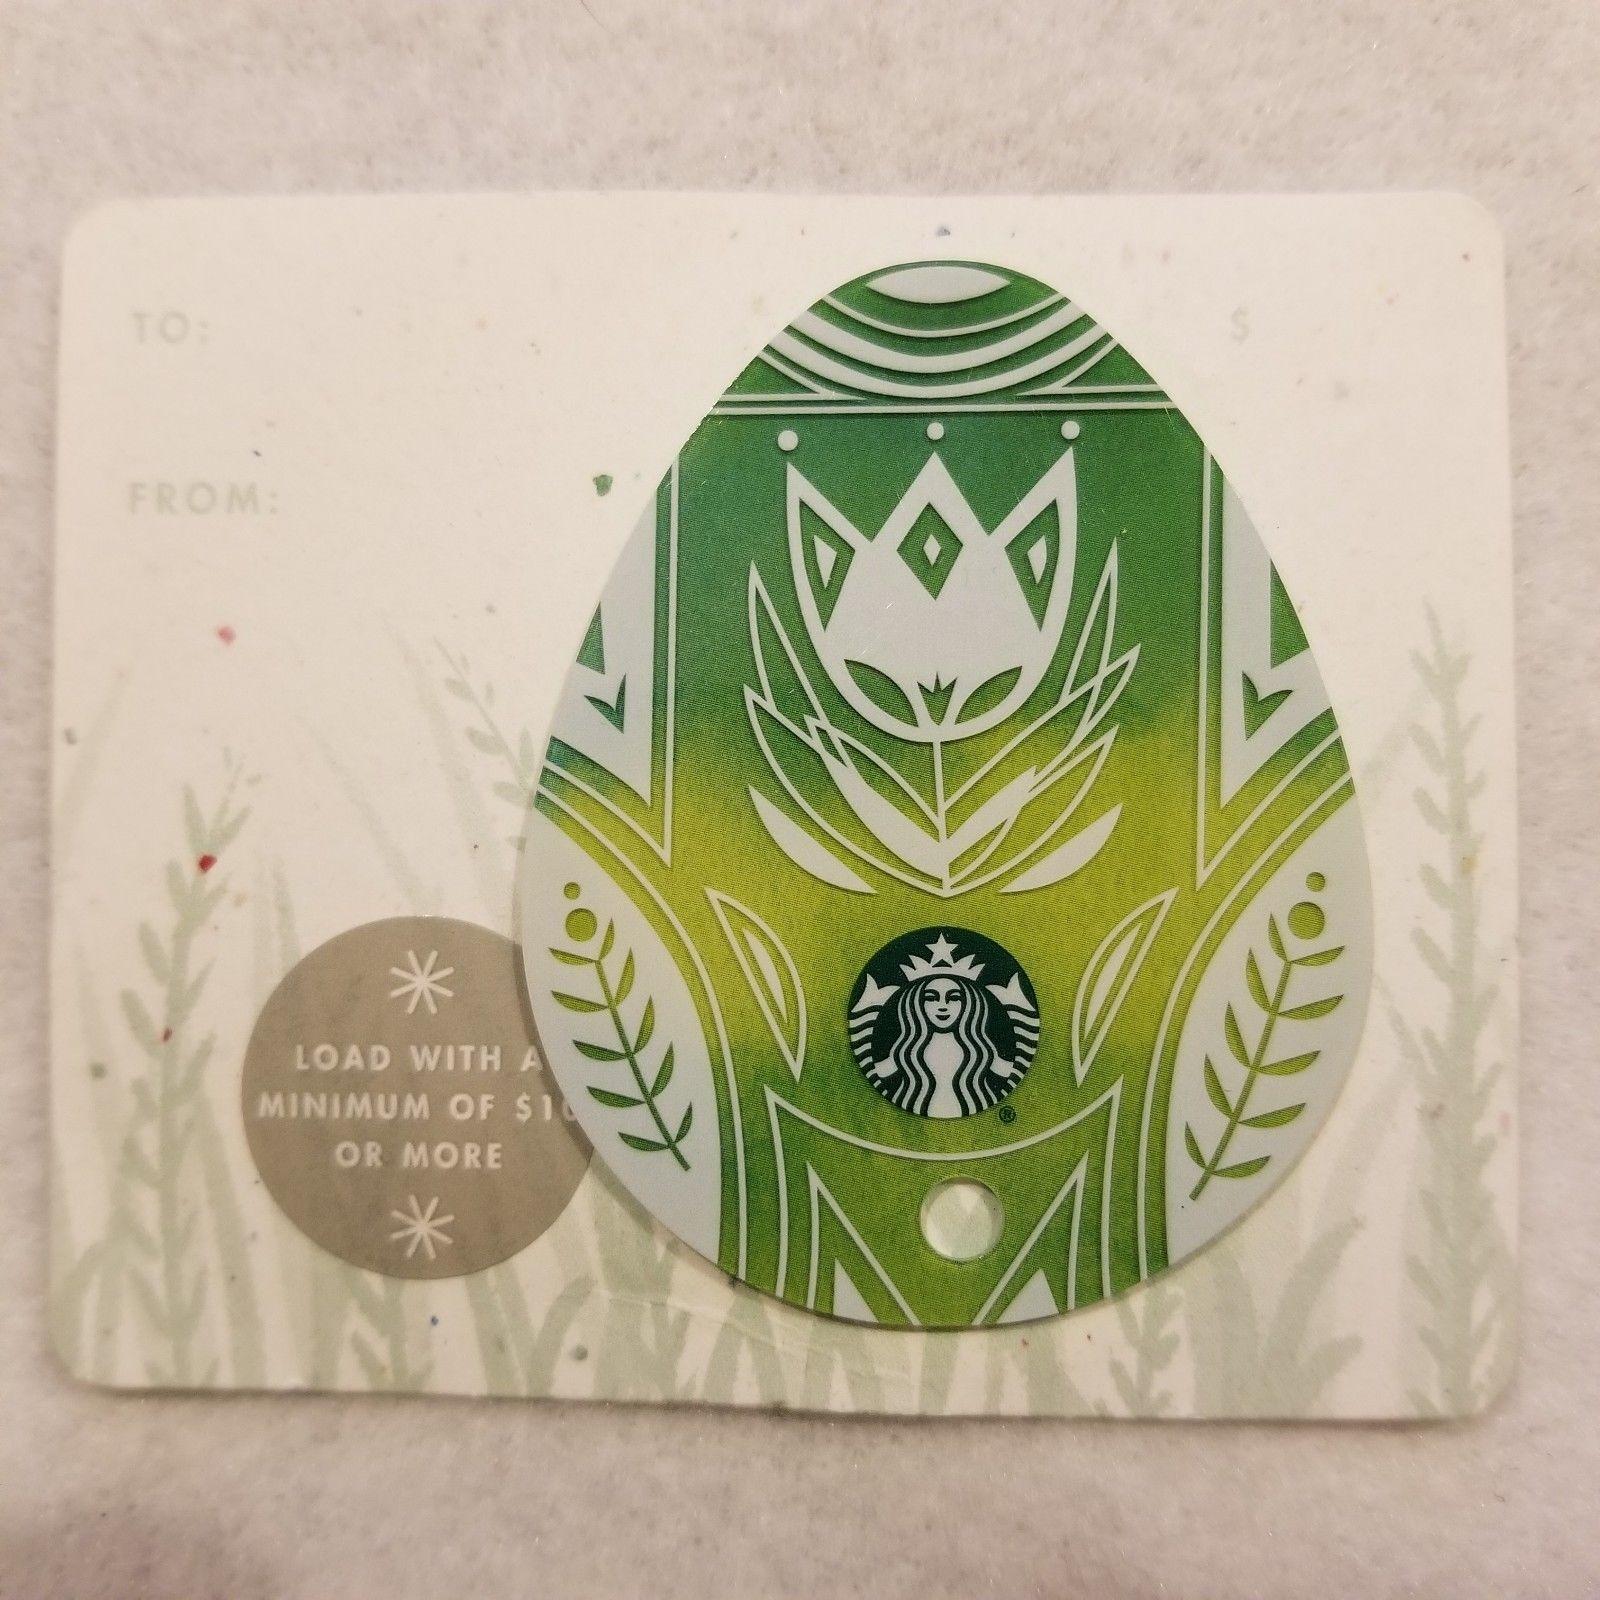 Starbucks Gift Card 2016 Egg Die Cut Green Flower Spring Happy Easter No Value